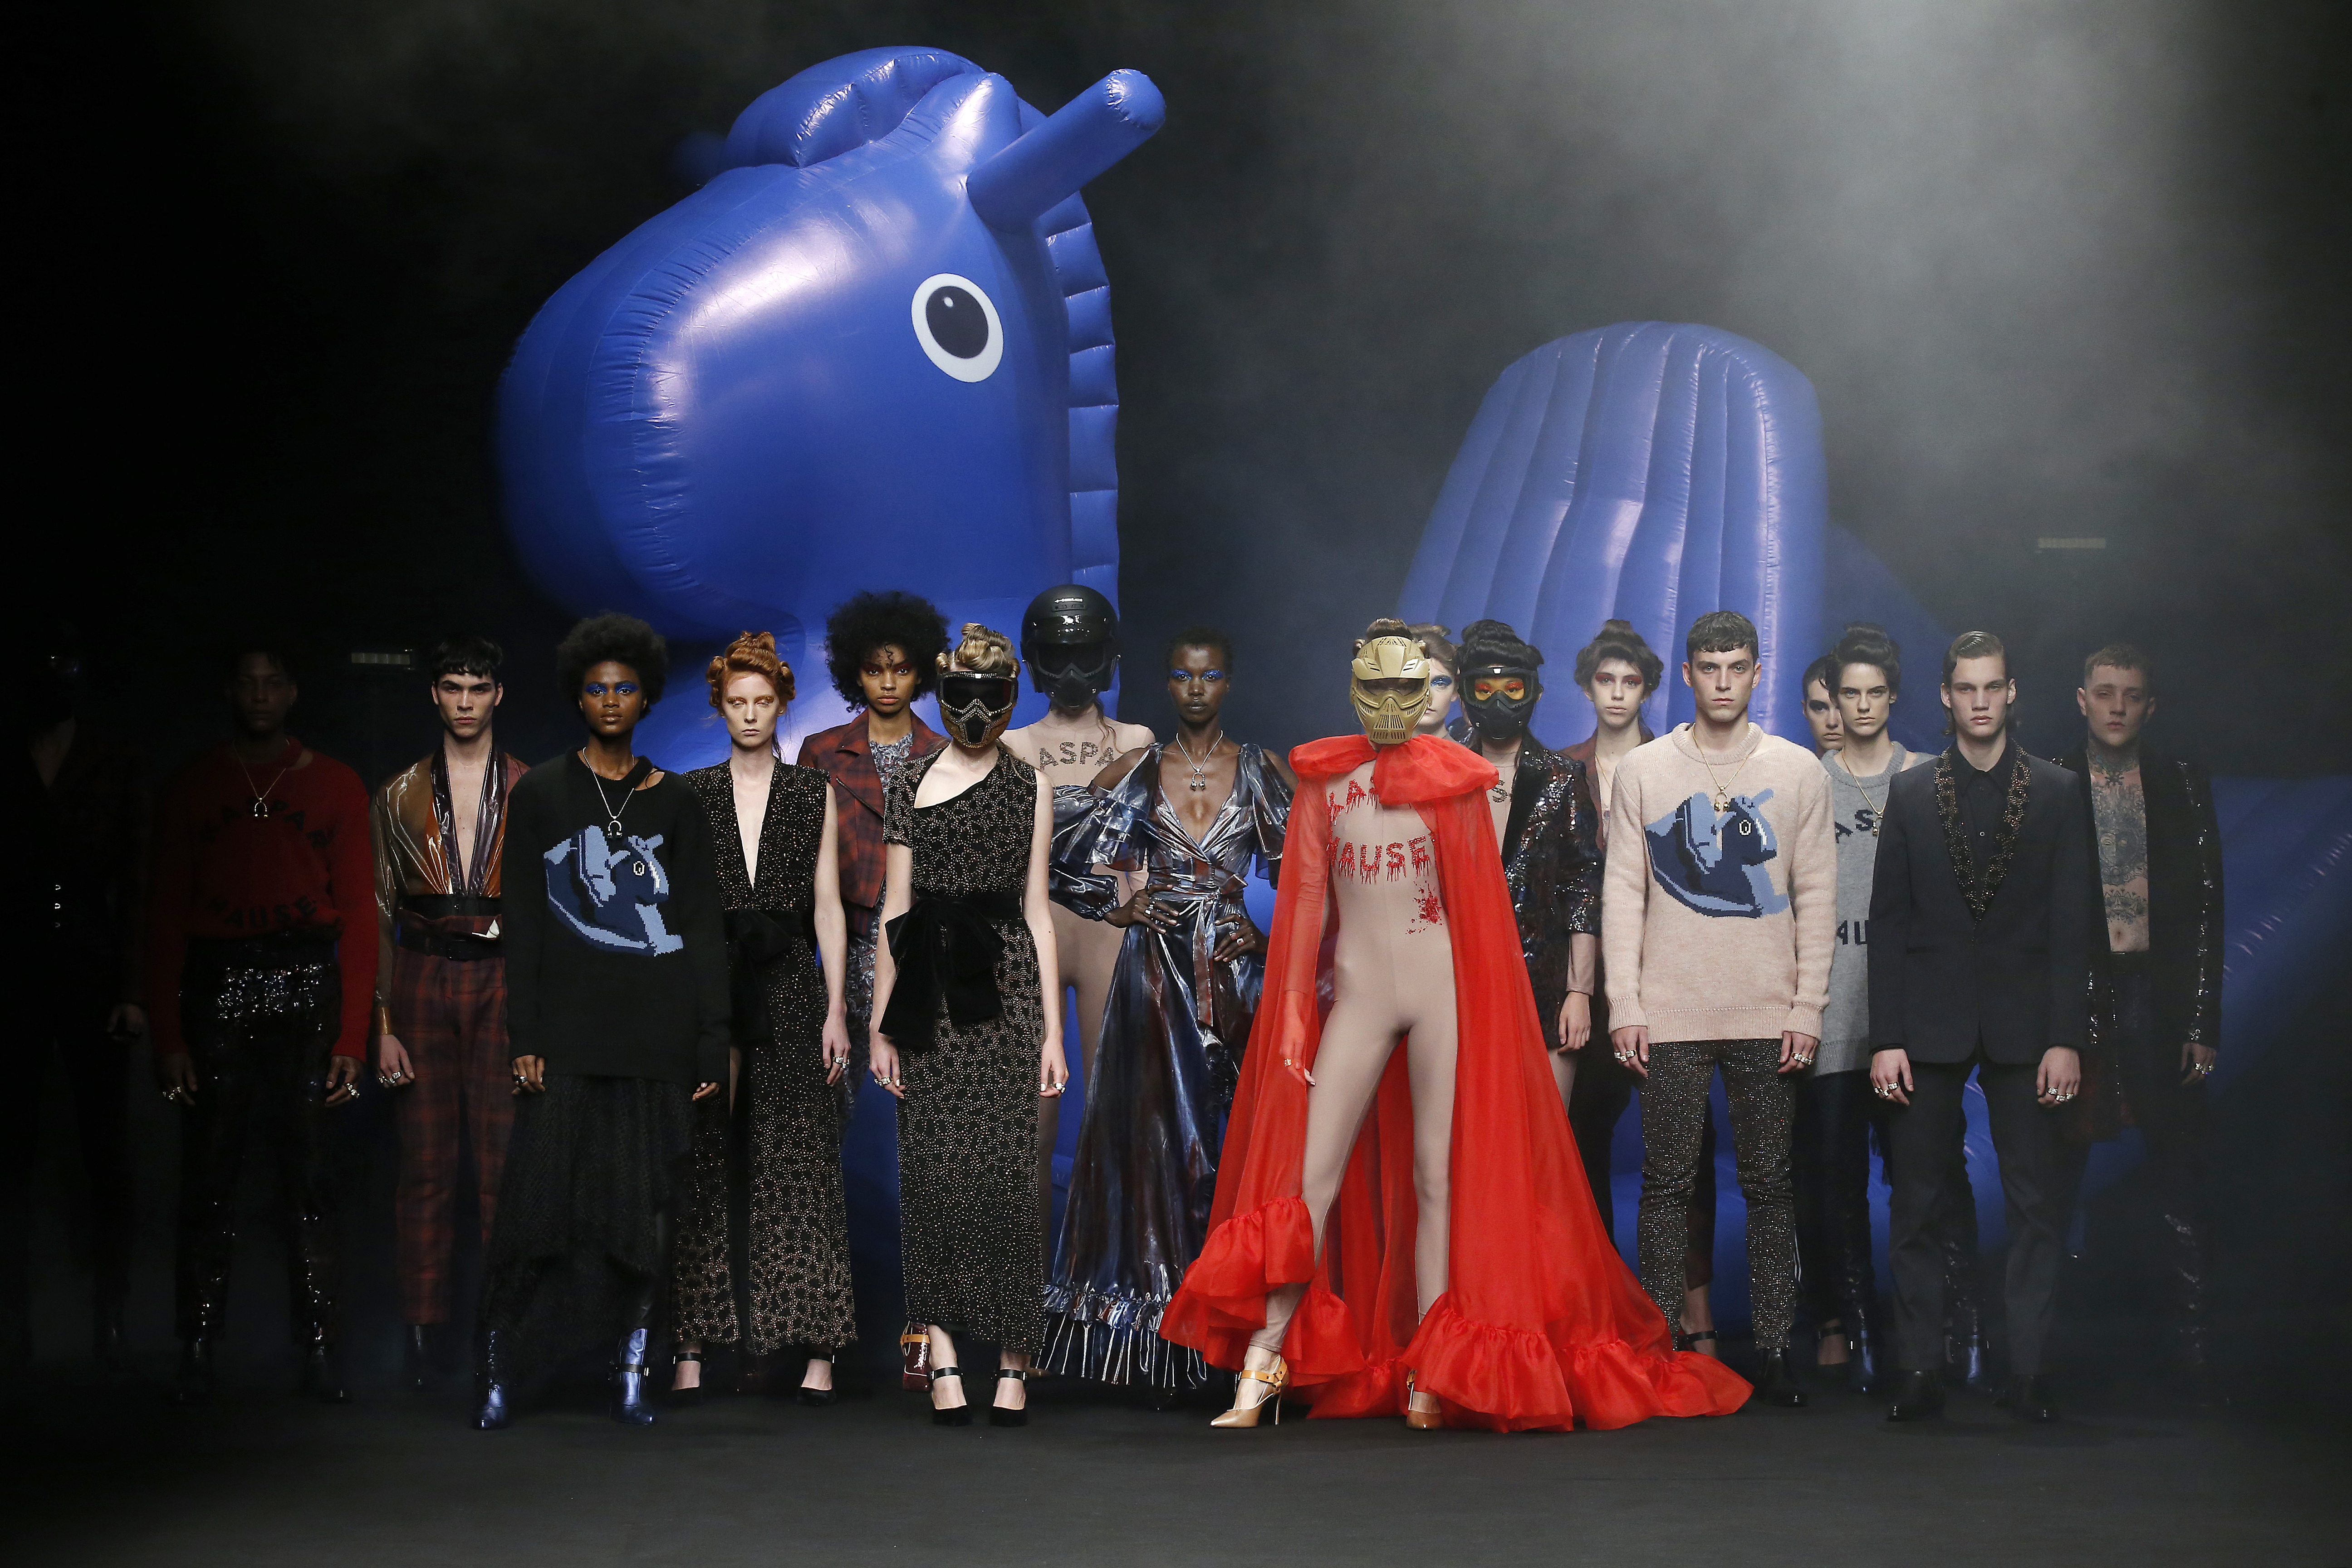 Ana Locking presenta Kaspar Hauser para la FW19-20 en la Mercedes Benz Fashion Week Madrid